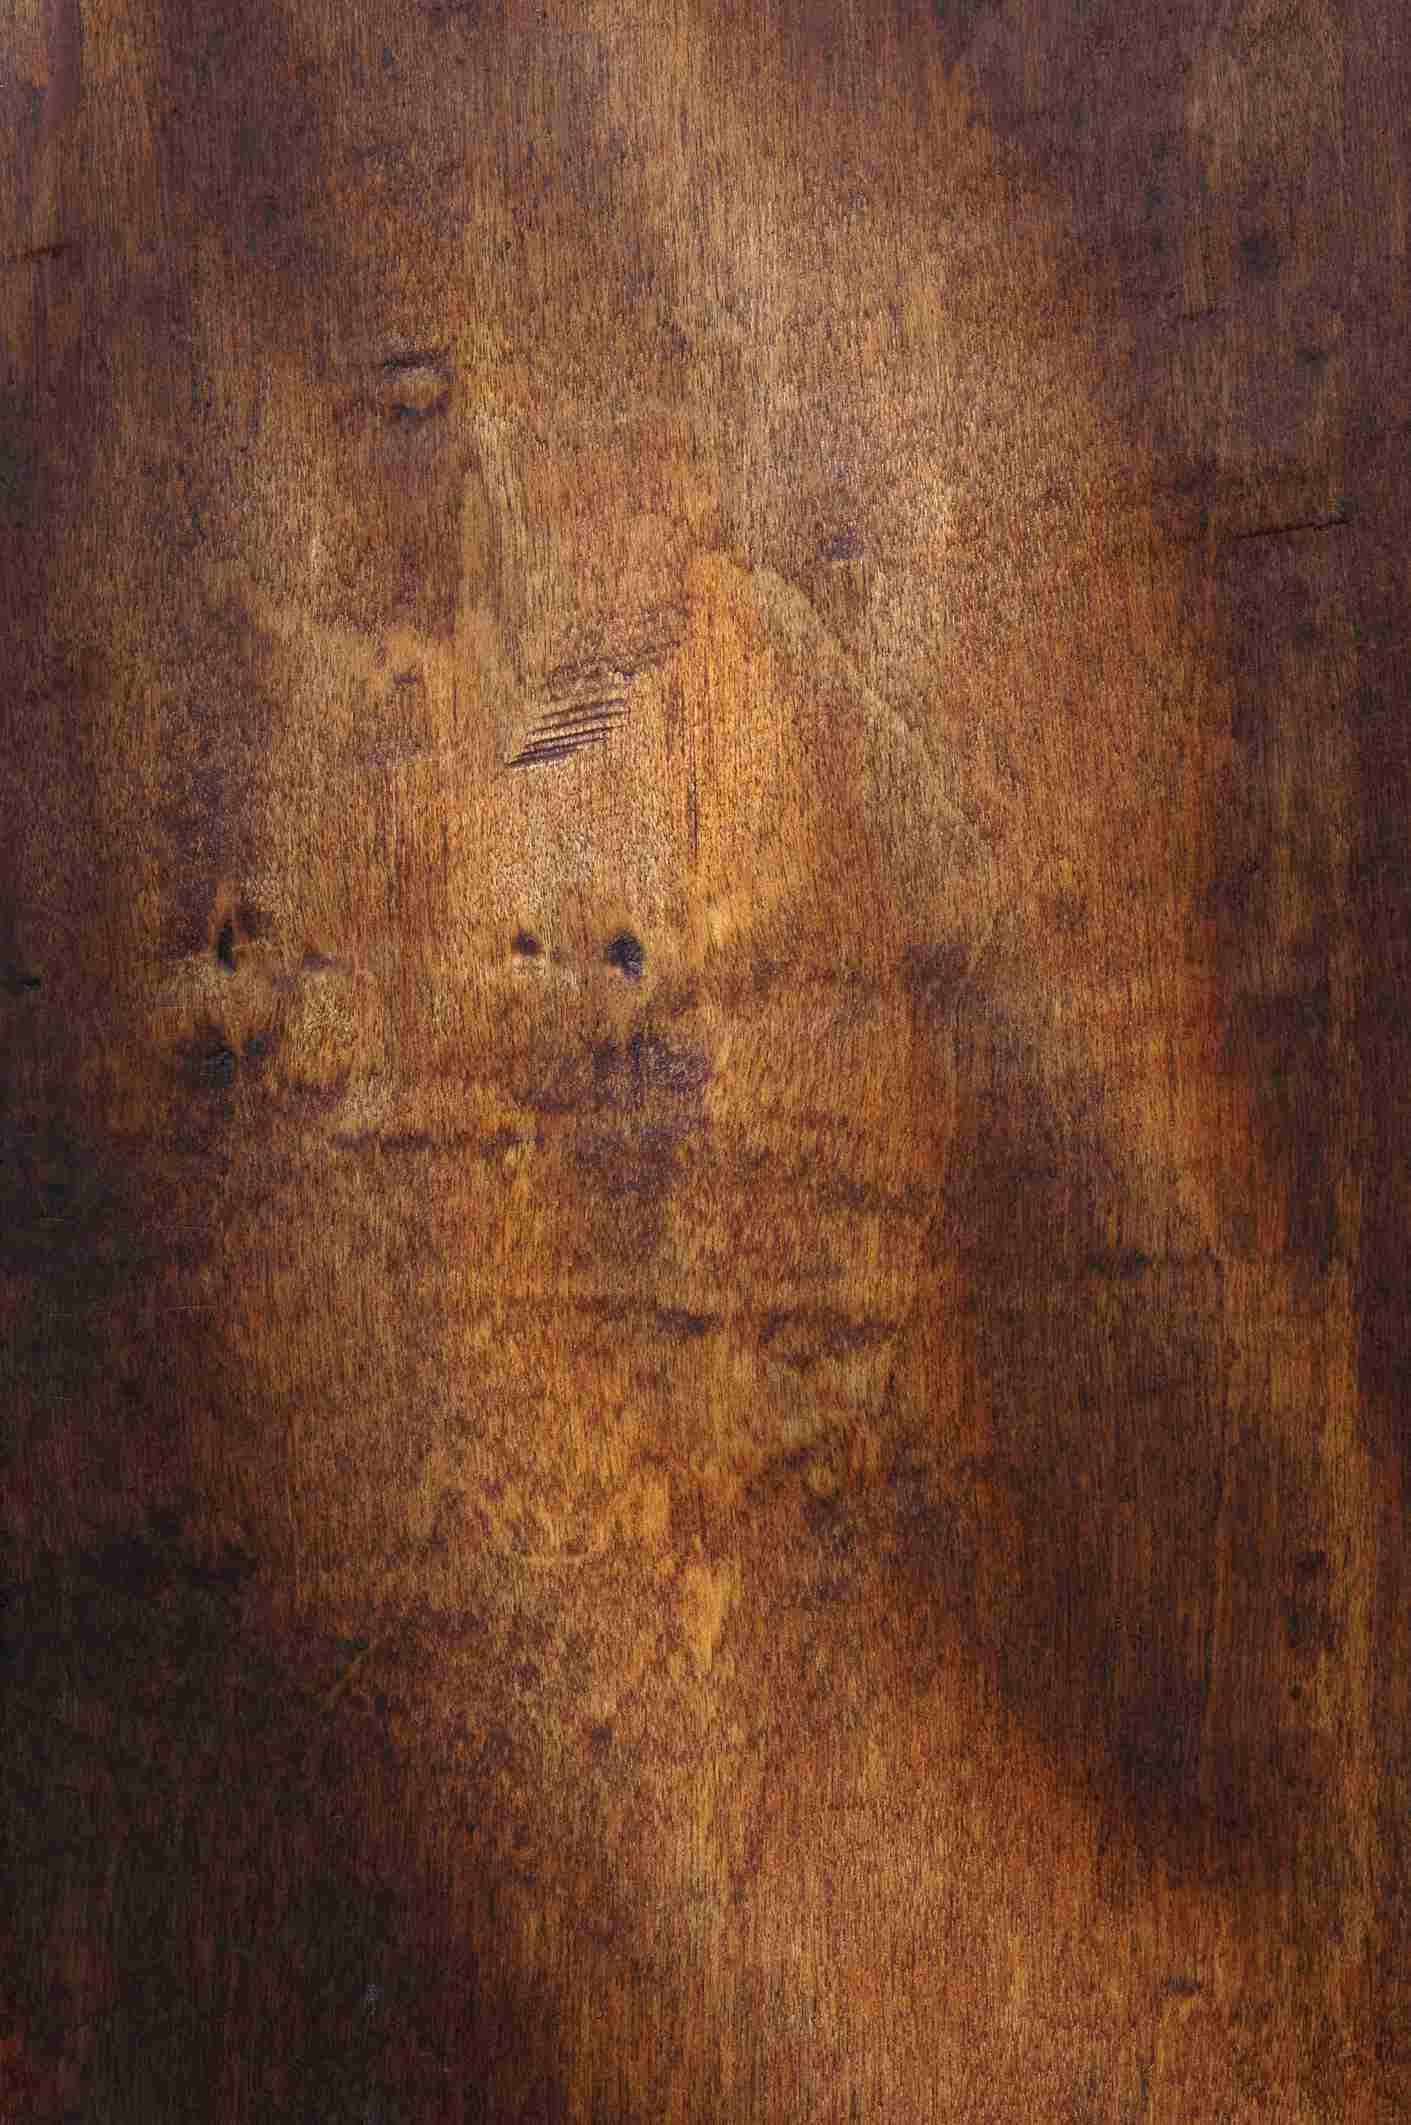 buy hardwood flooring canada of hardwood species for spindle turning the best wood inside smokey hardwood 172318827 584f11c53df78c491e38f6fb